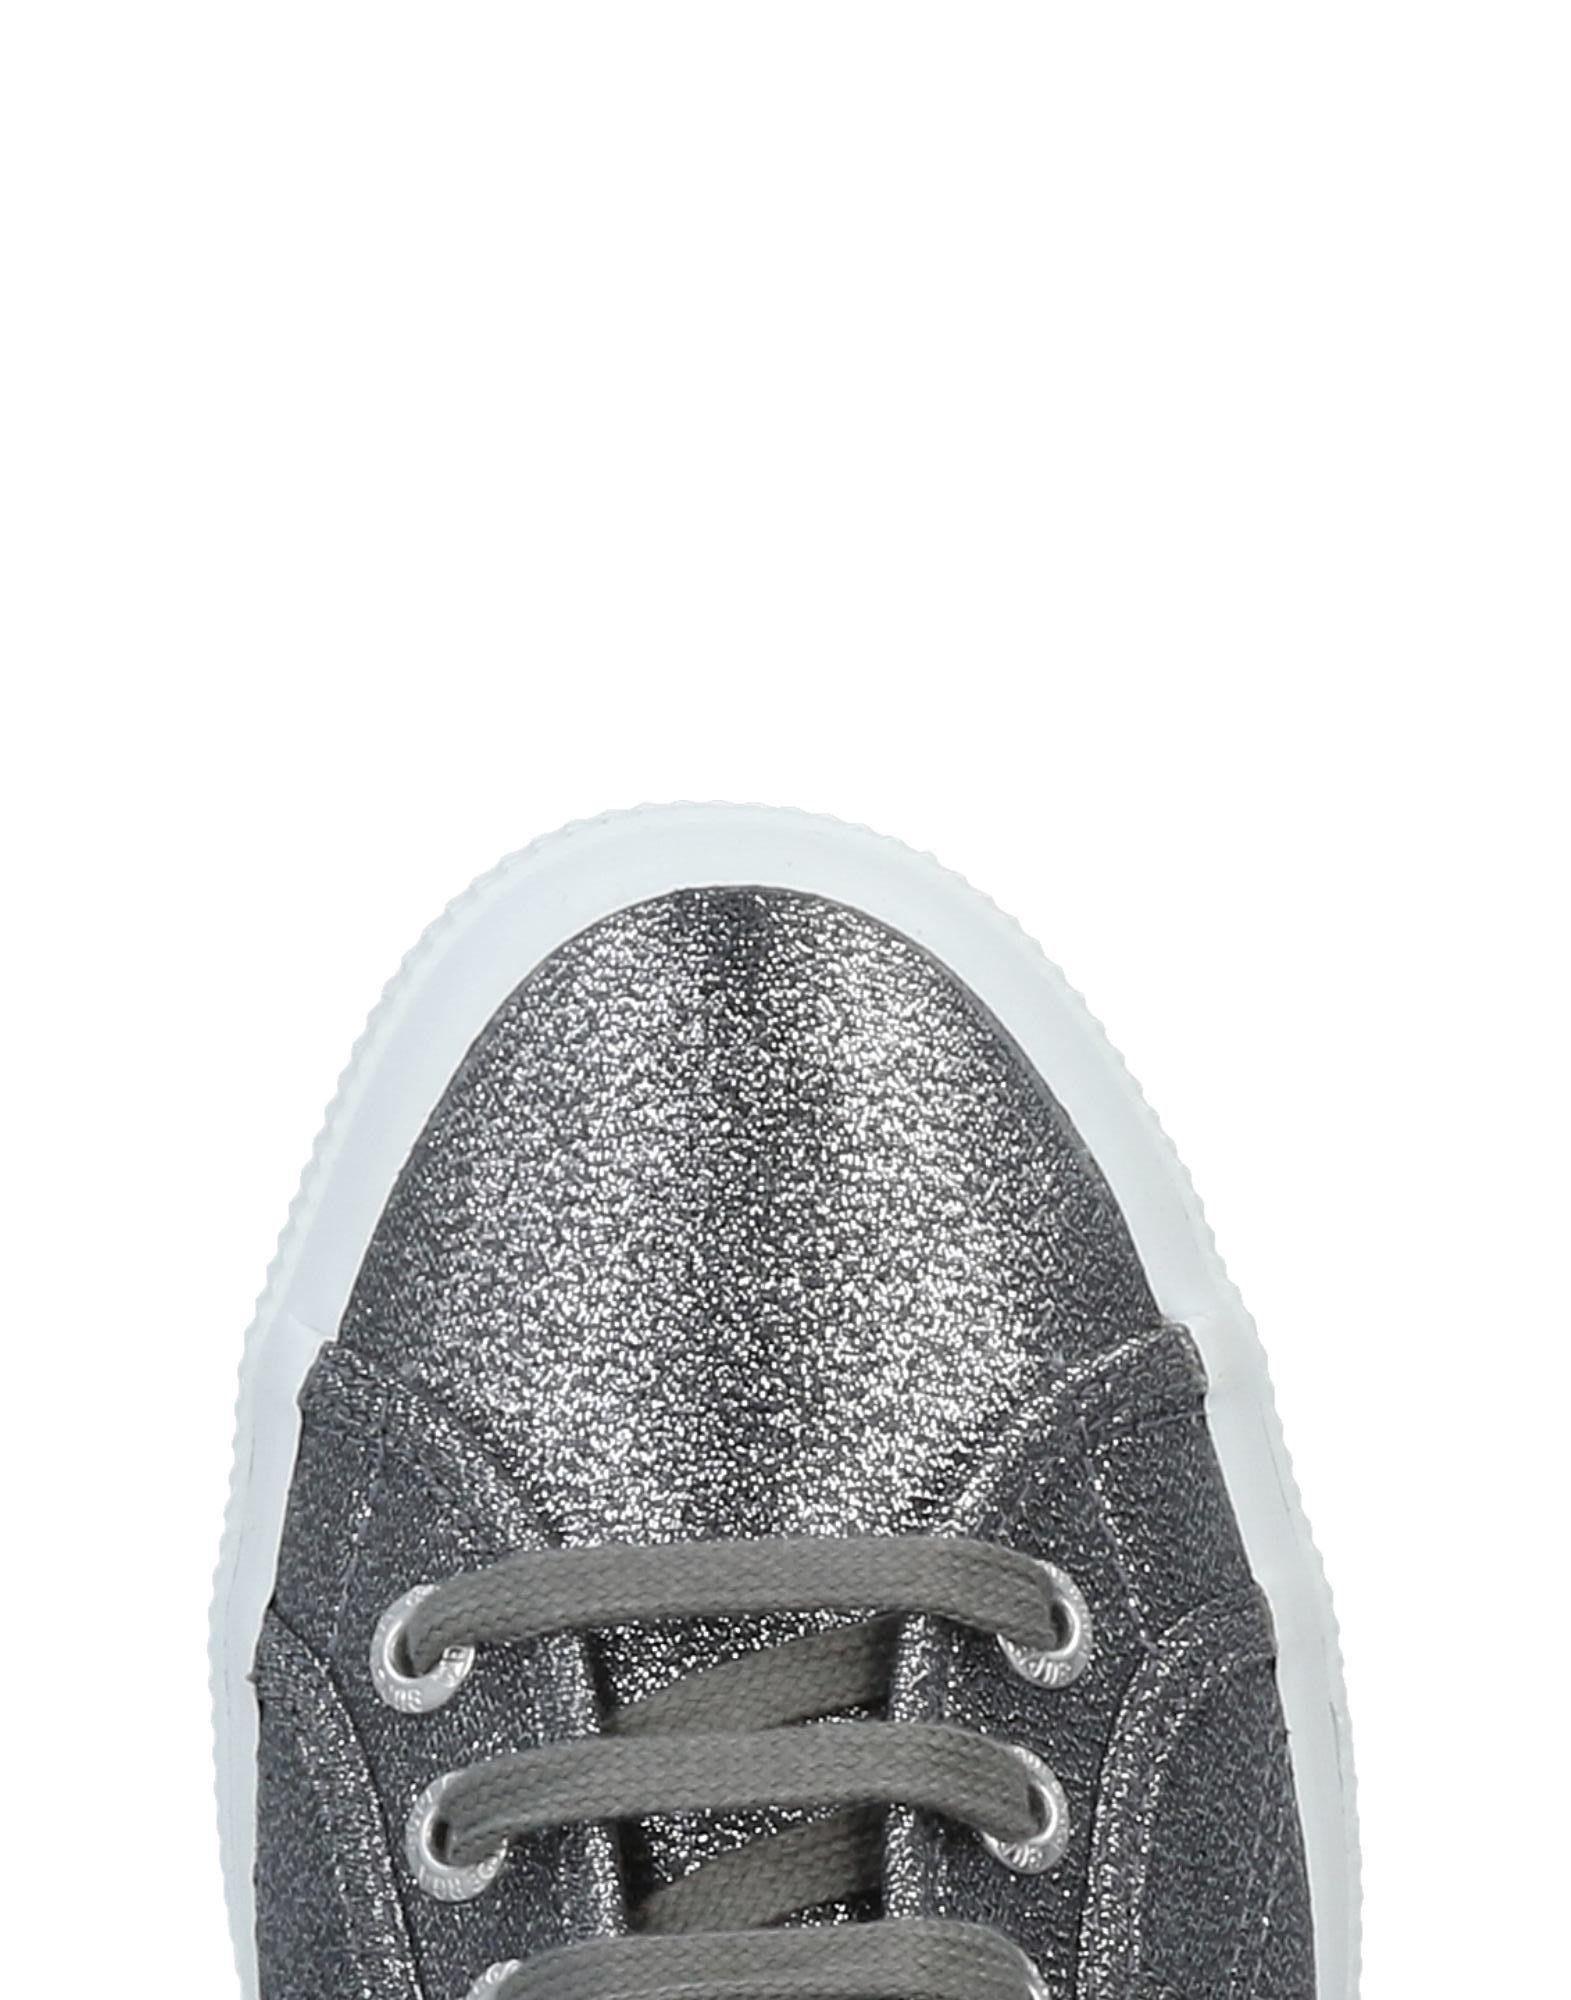 Superga Low-tops & Sneakers in Lead (Grey)